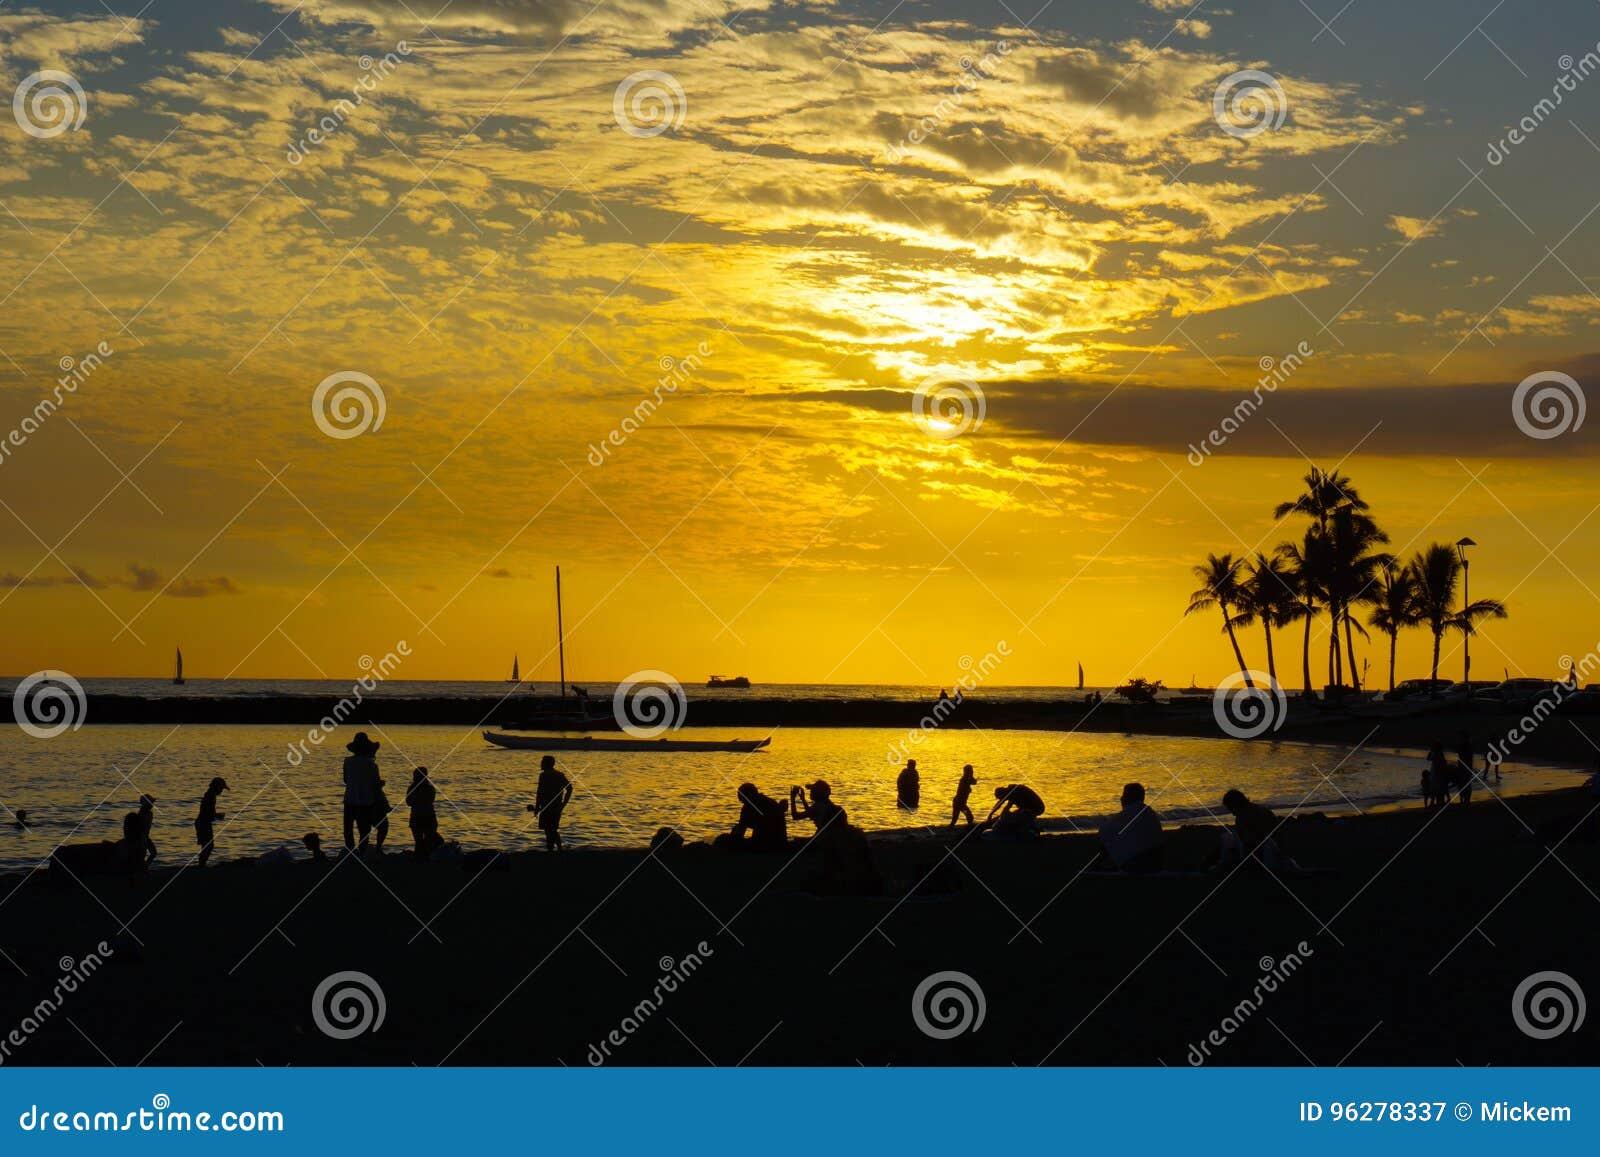 Небо тропического захода солнца золотое